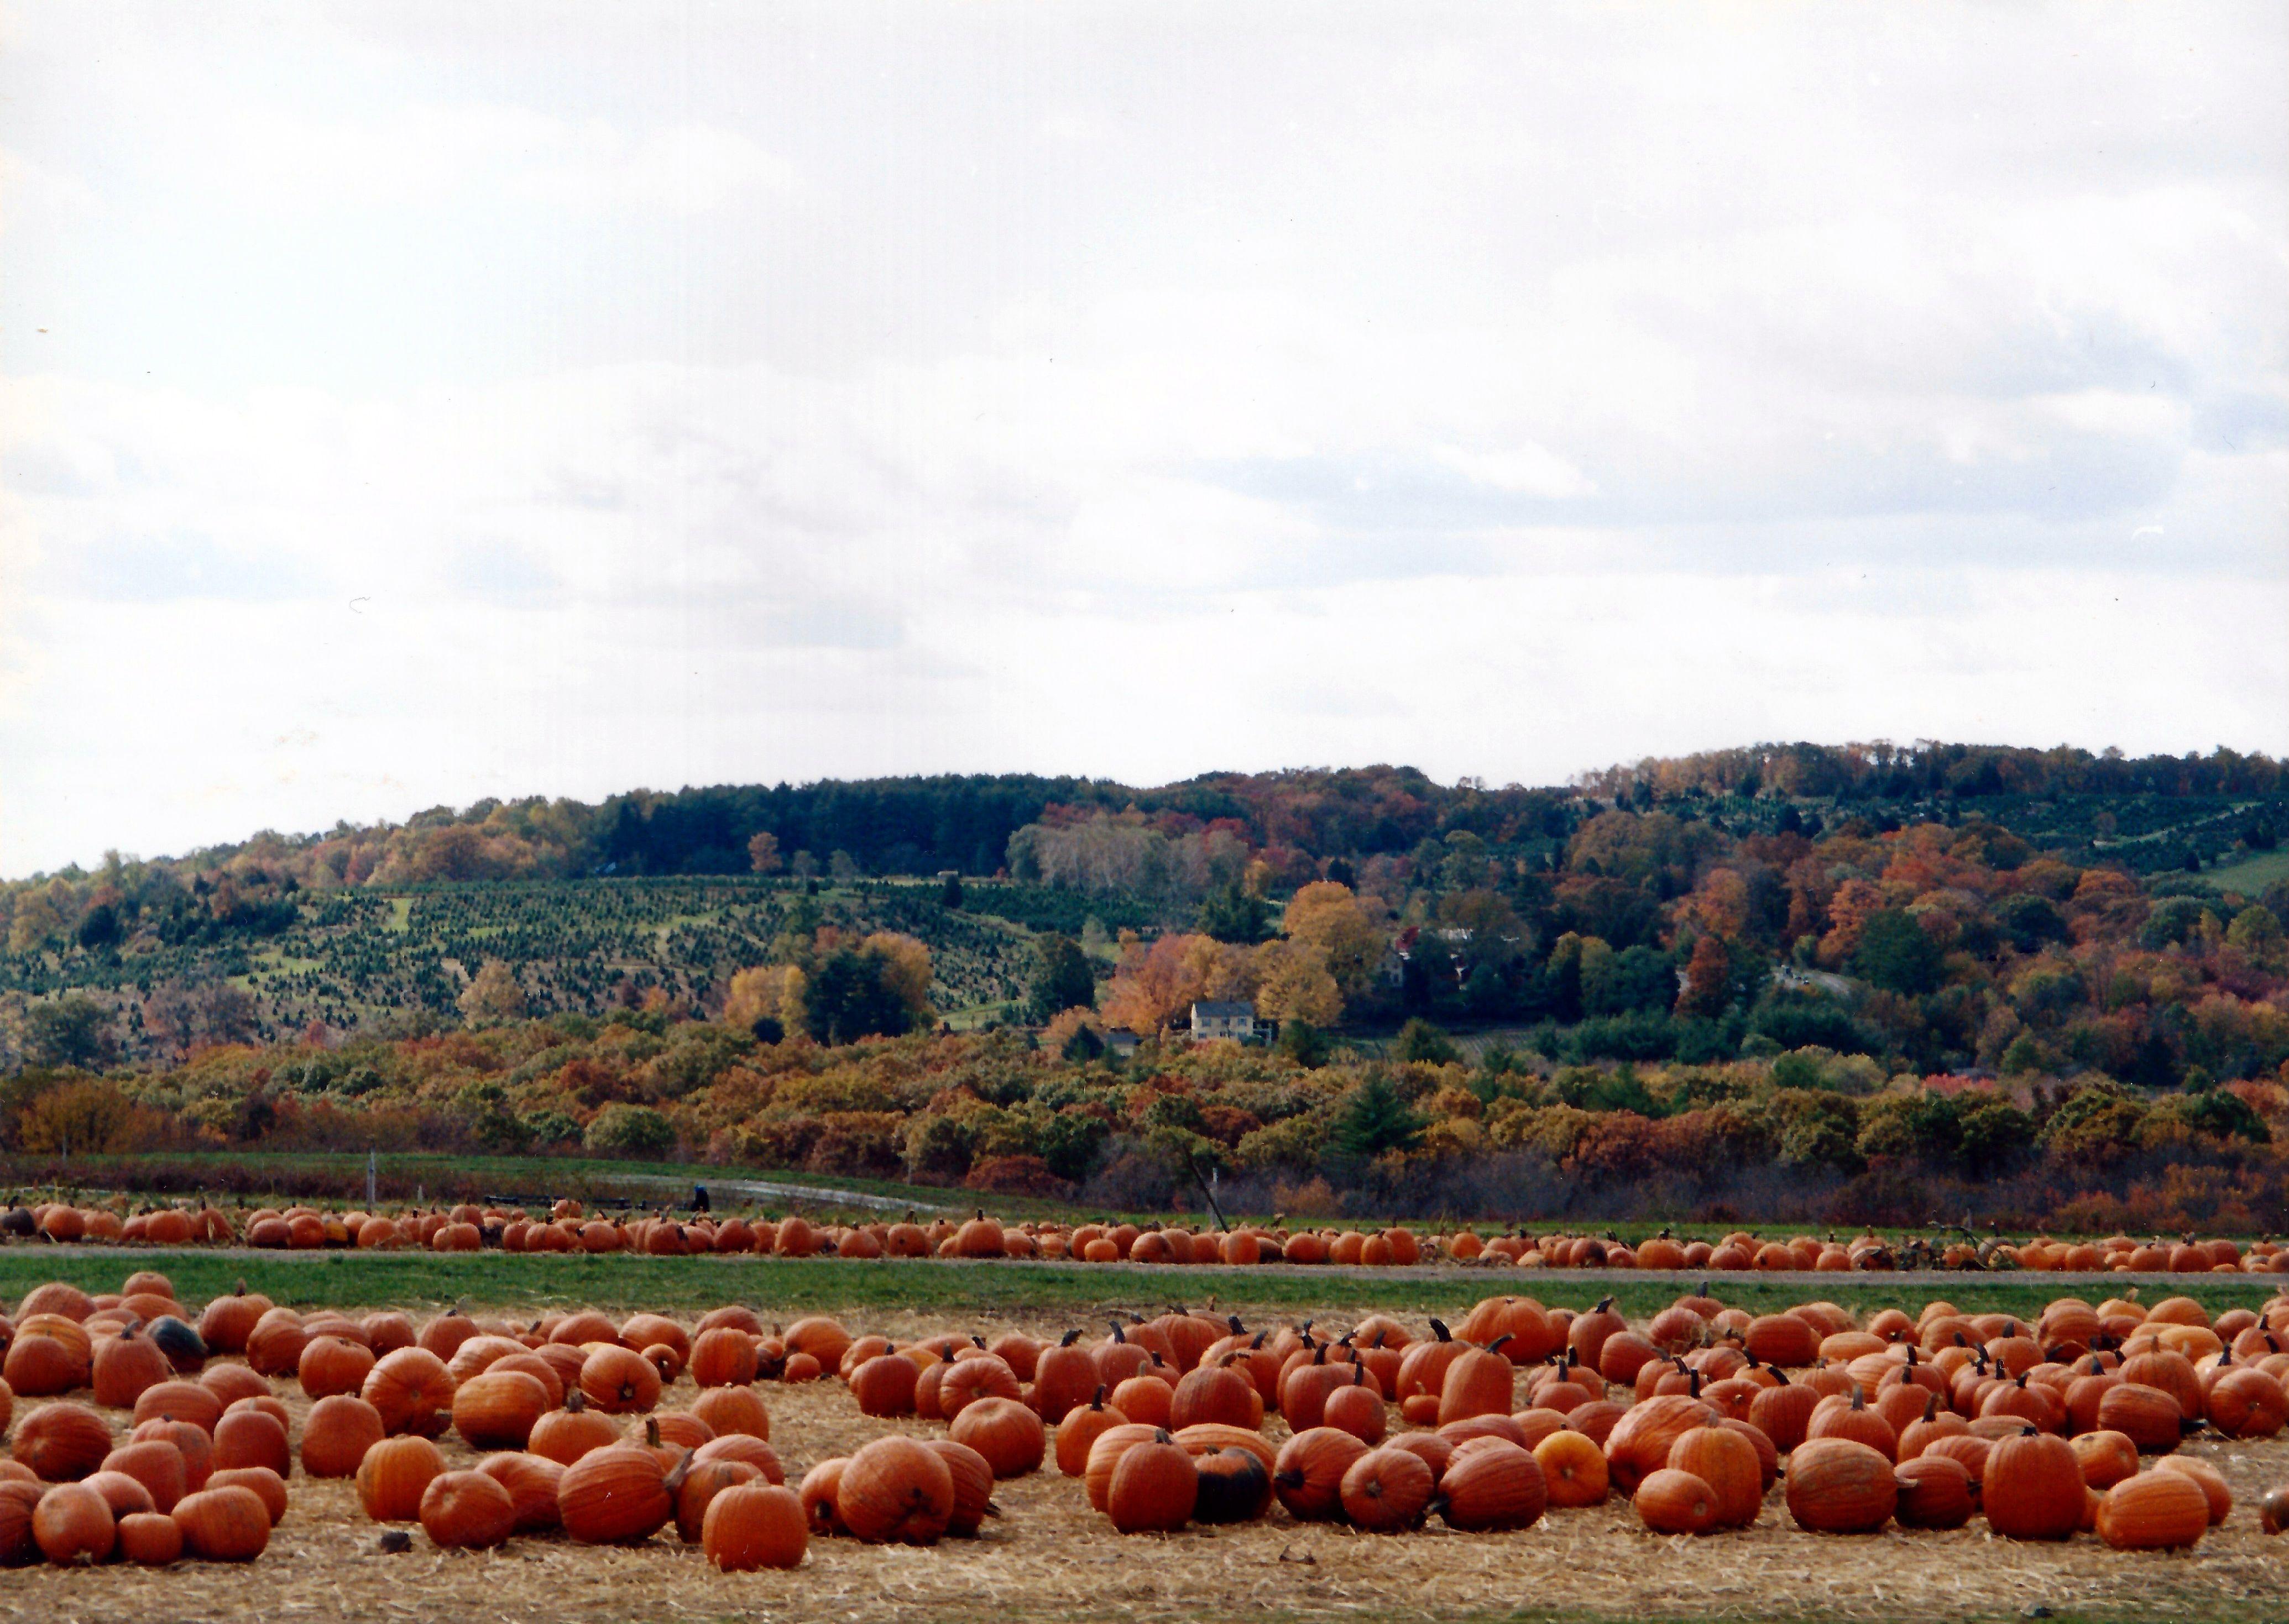 Jones Family Farm In Shelton Connecticut I Miss Going There To Get Pumpkins Jones Family Family Farm Pumpkin